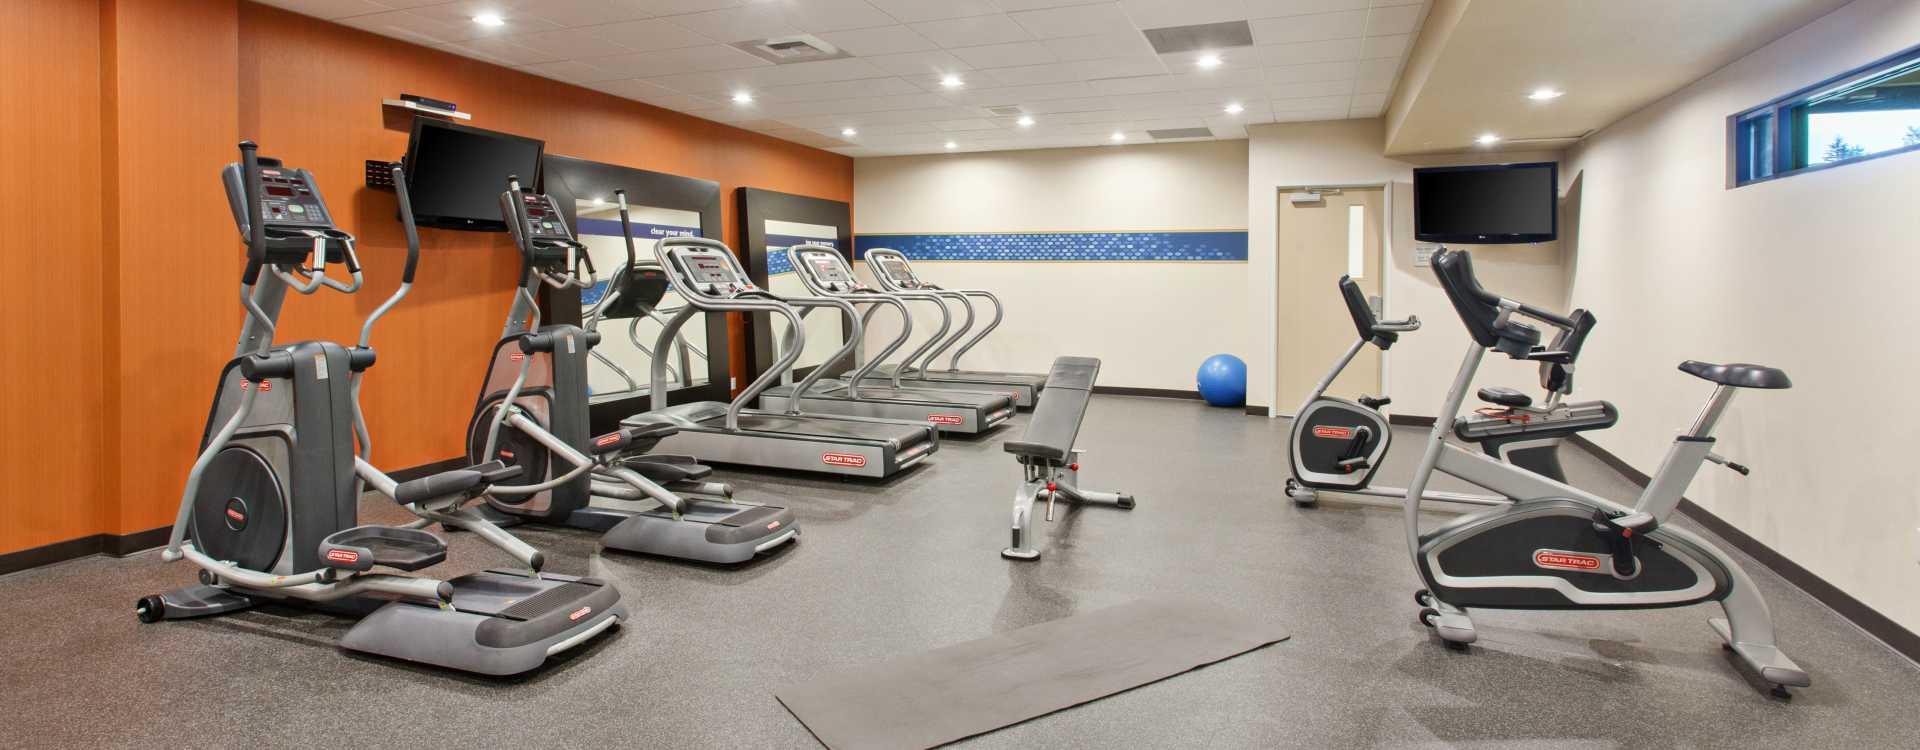 Hampton Inn Seattle Airport Fitness Room